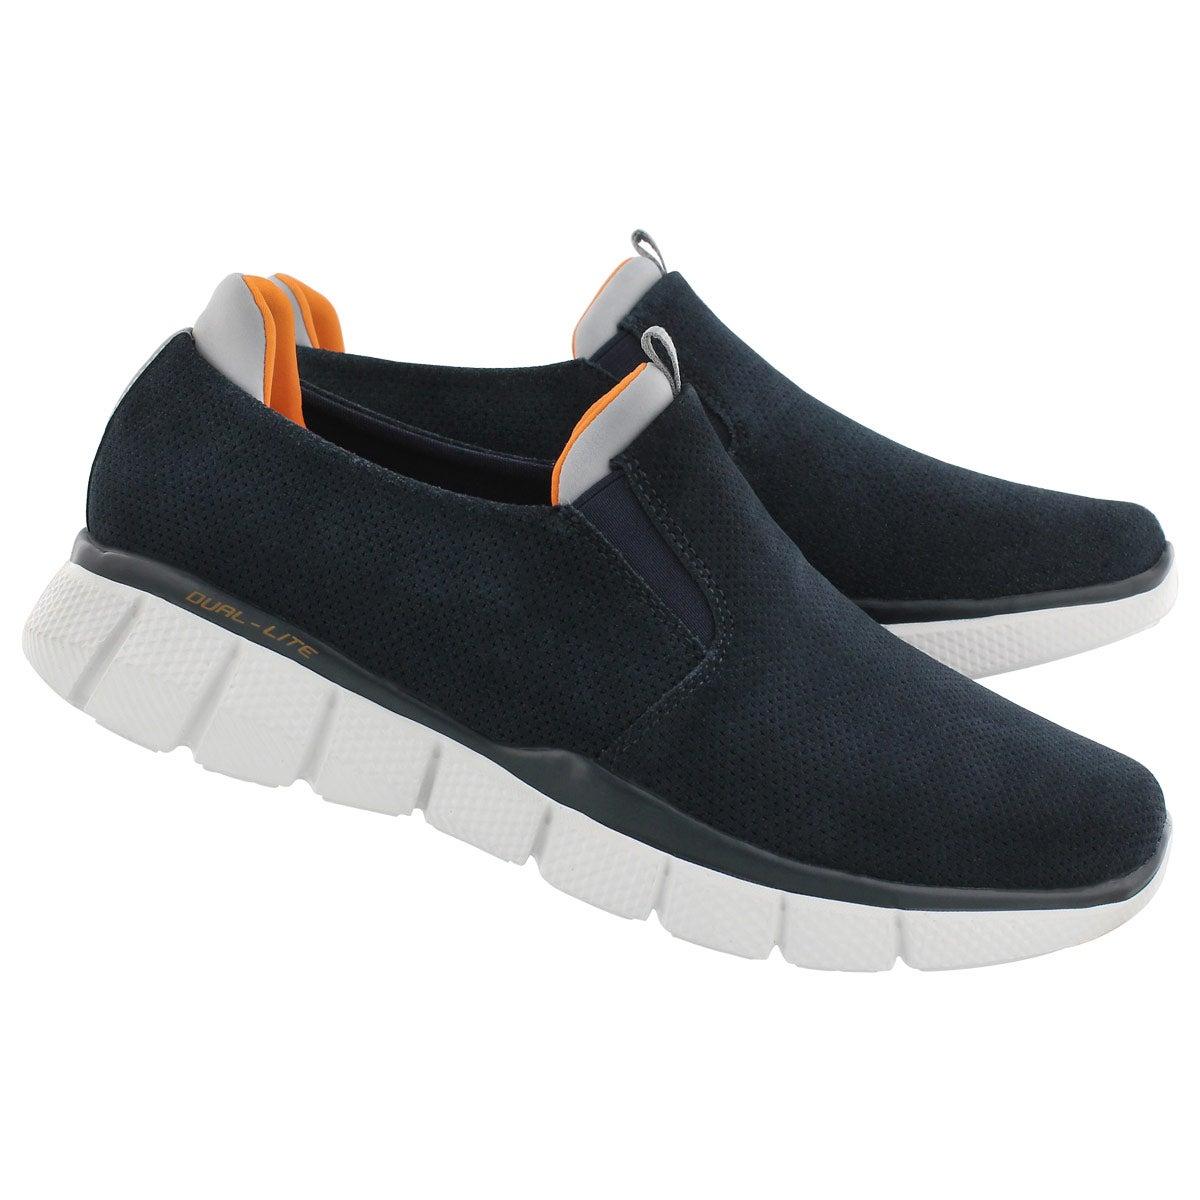 Mns Equalizer 2.0 Rodini nvy slipon shoe